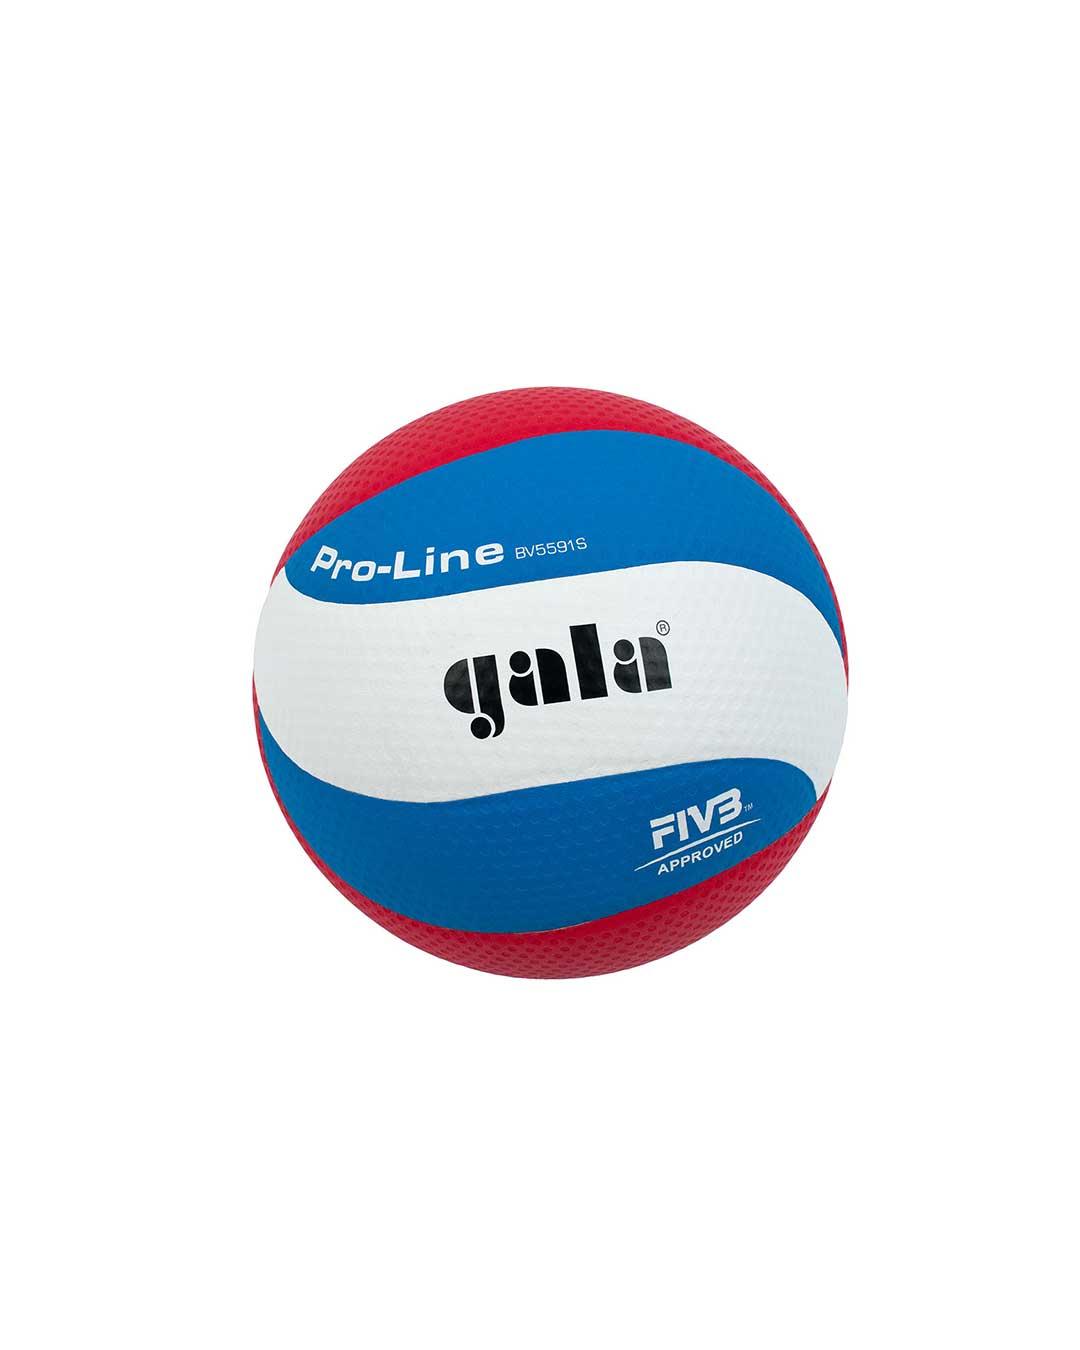 Balón de voleibol competencia marca Gala  PRO-LINE certificado FIVB